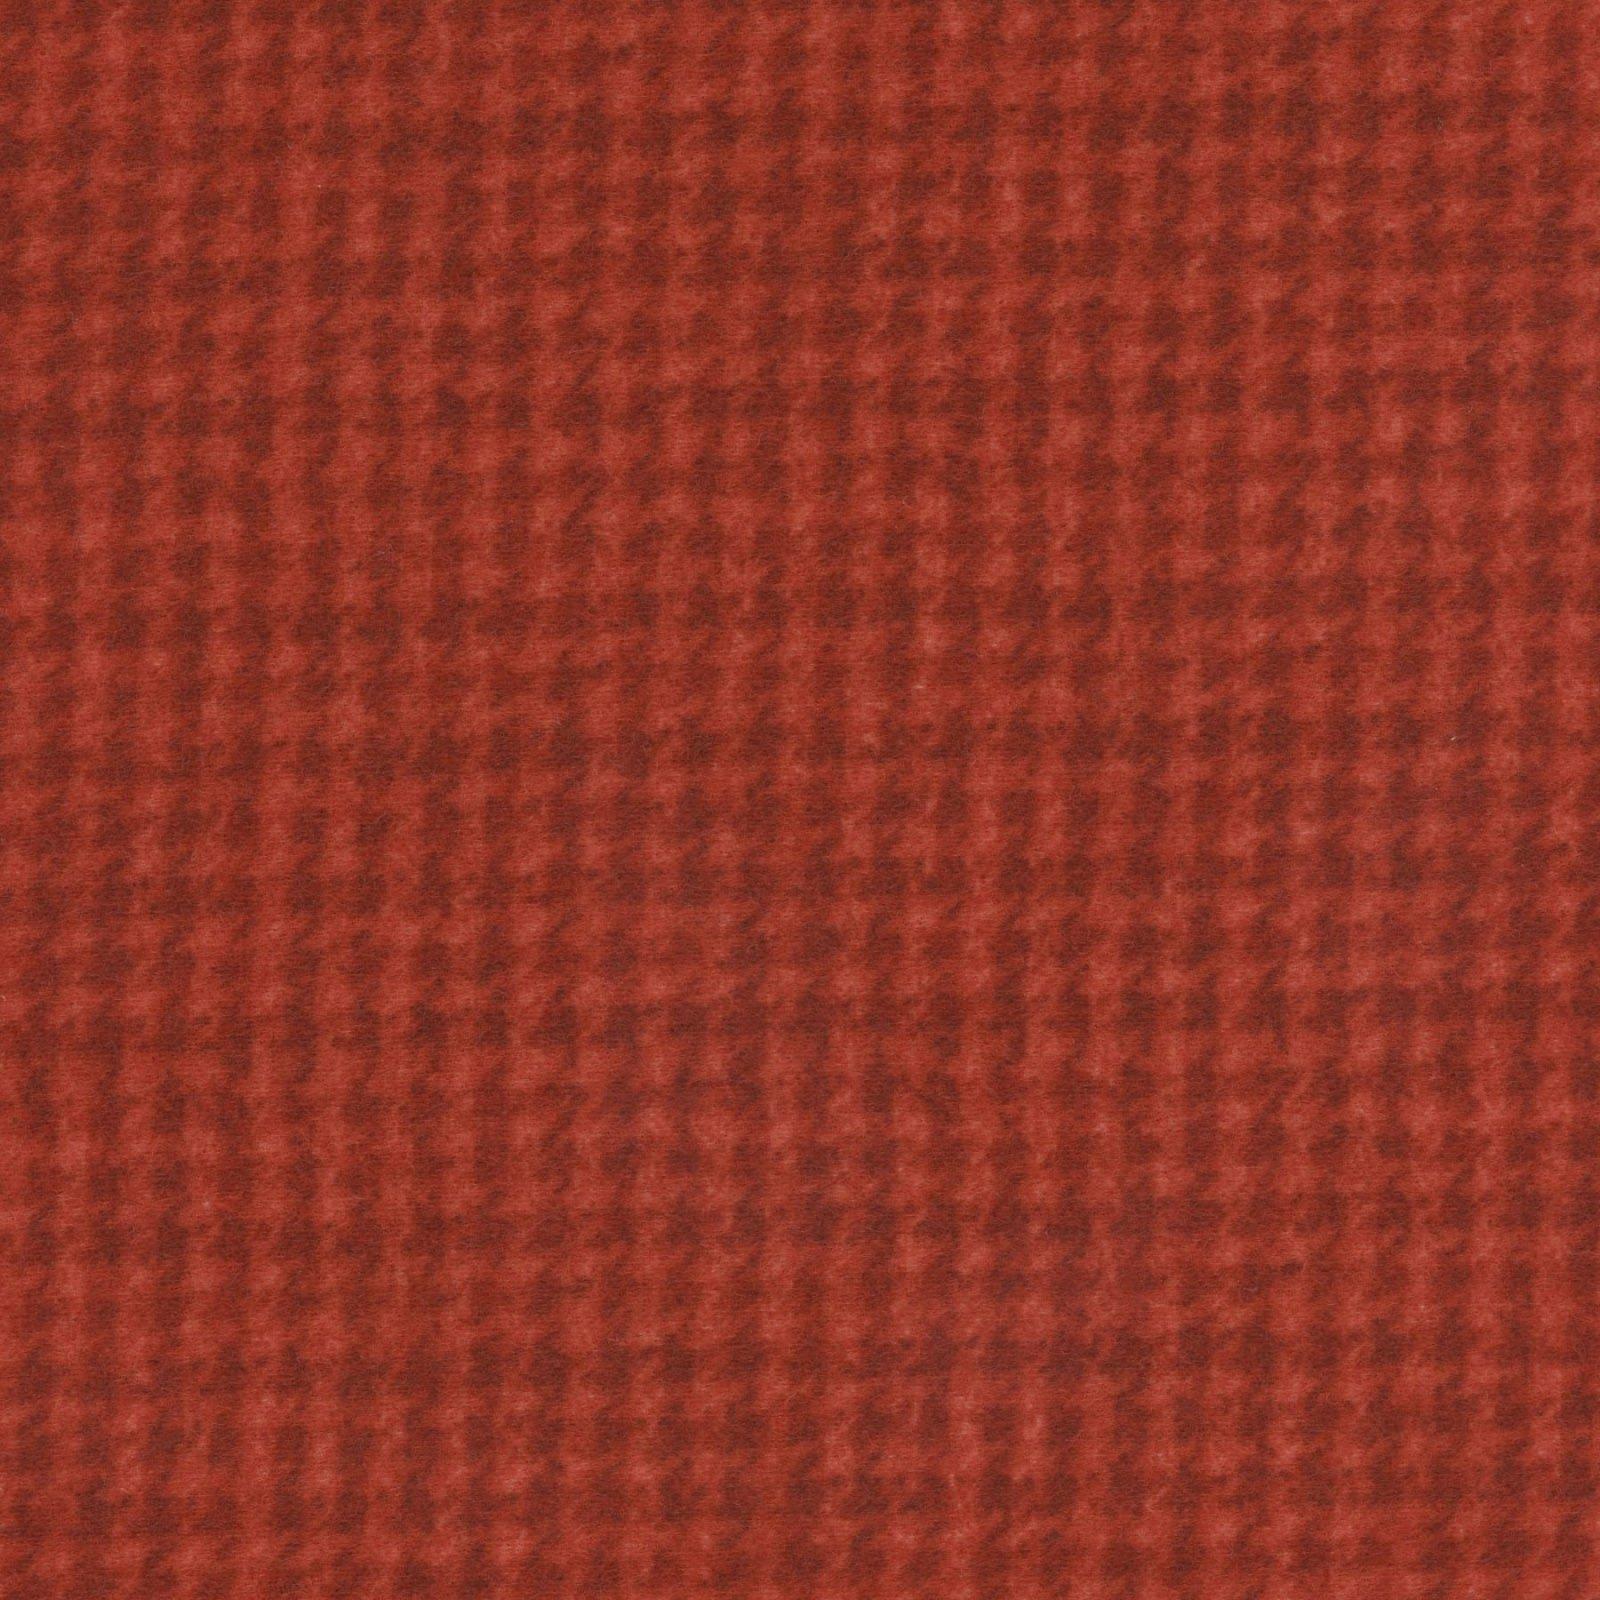 Woolies Flannel F18503-R